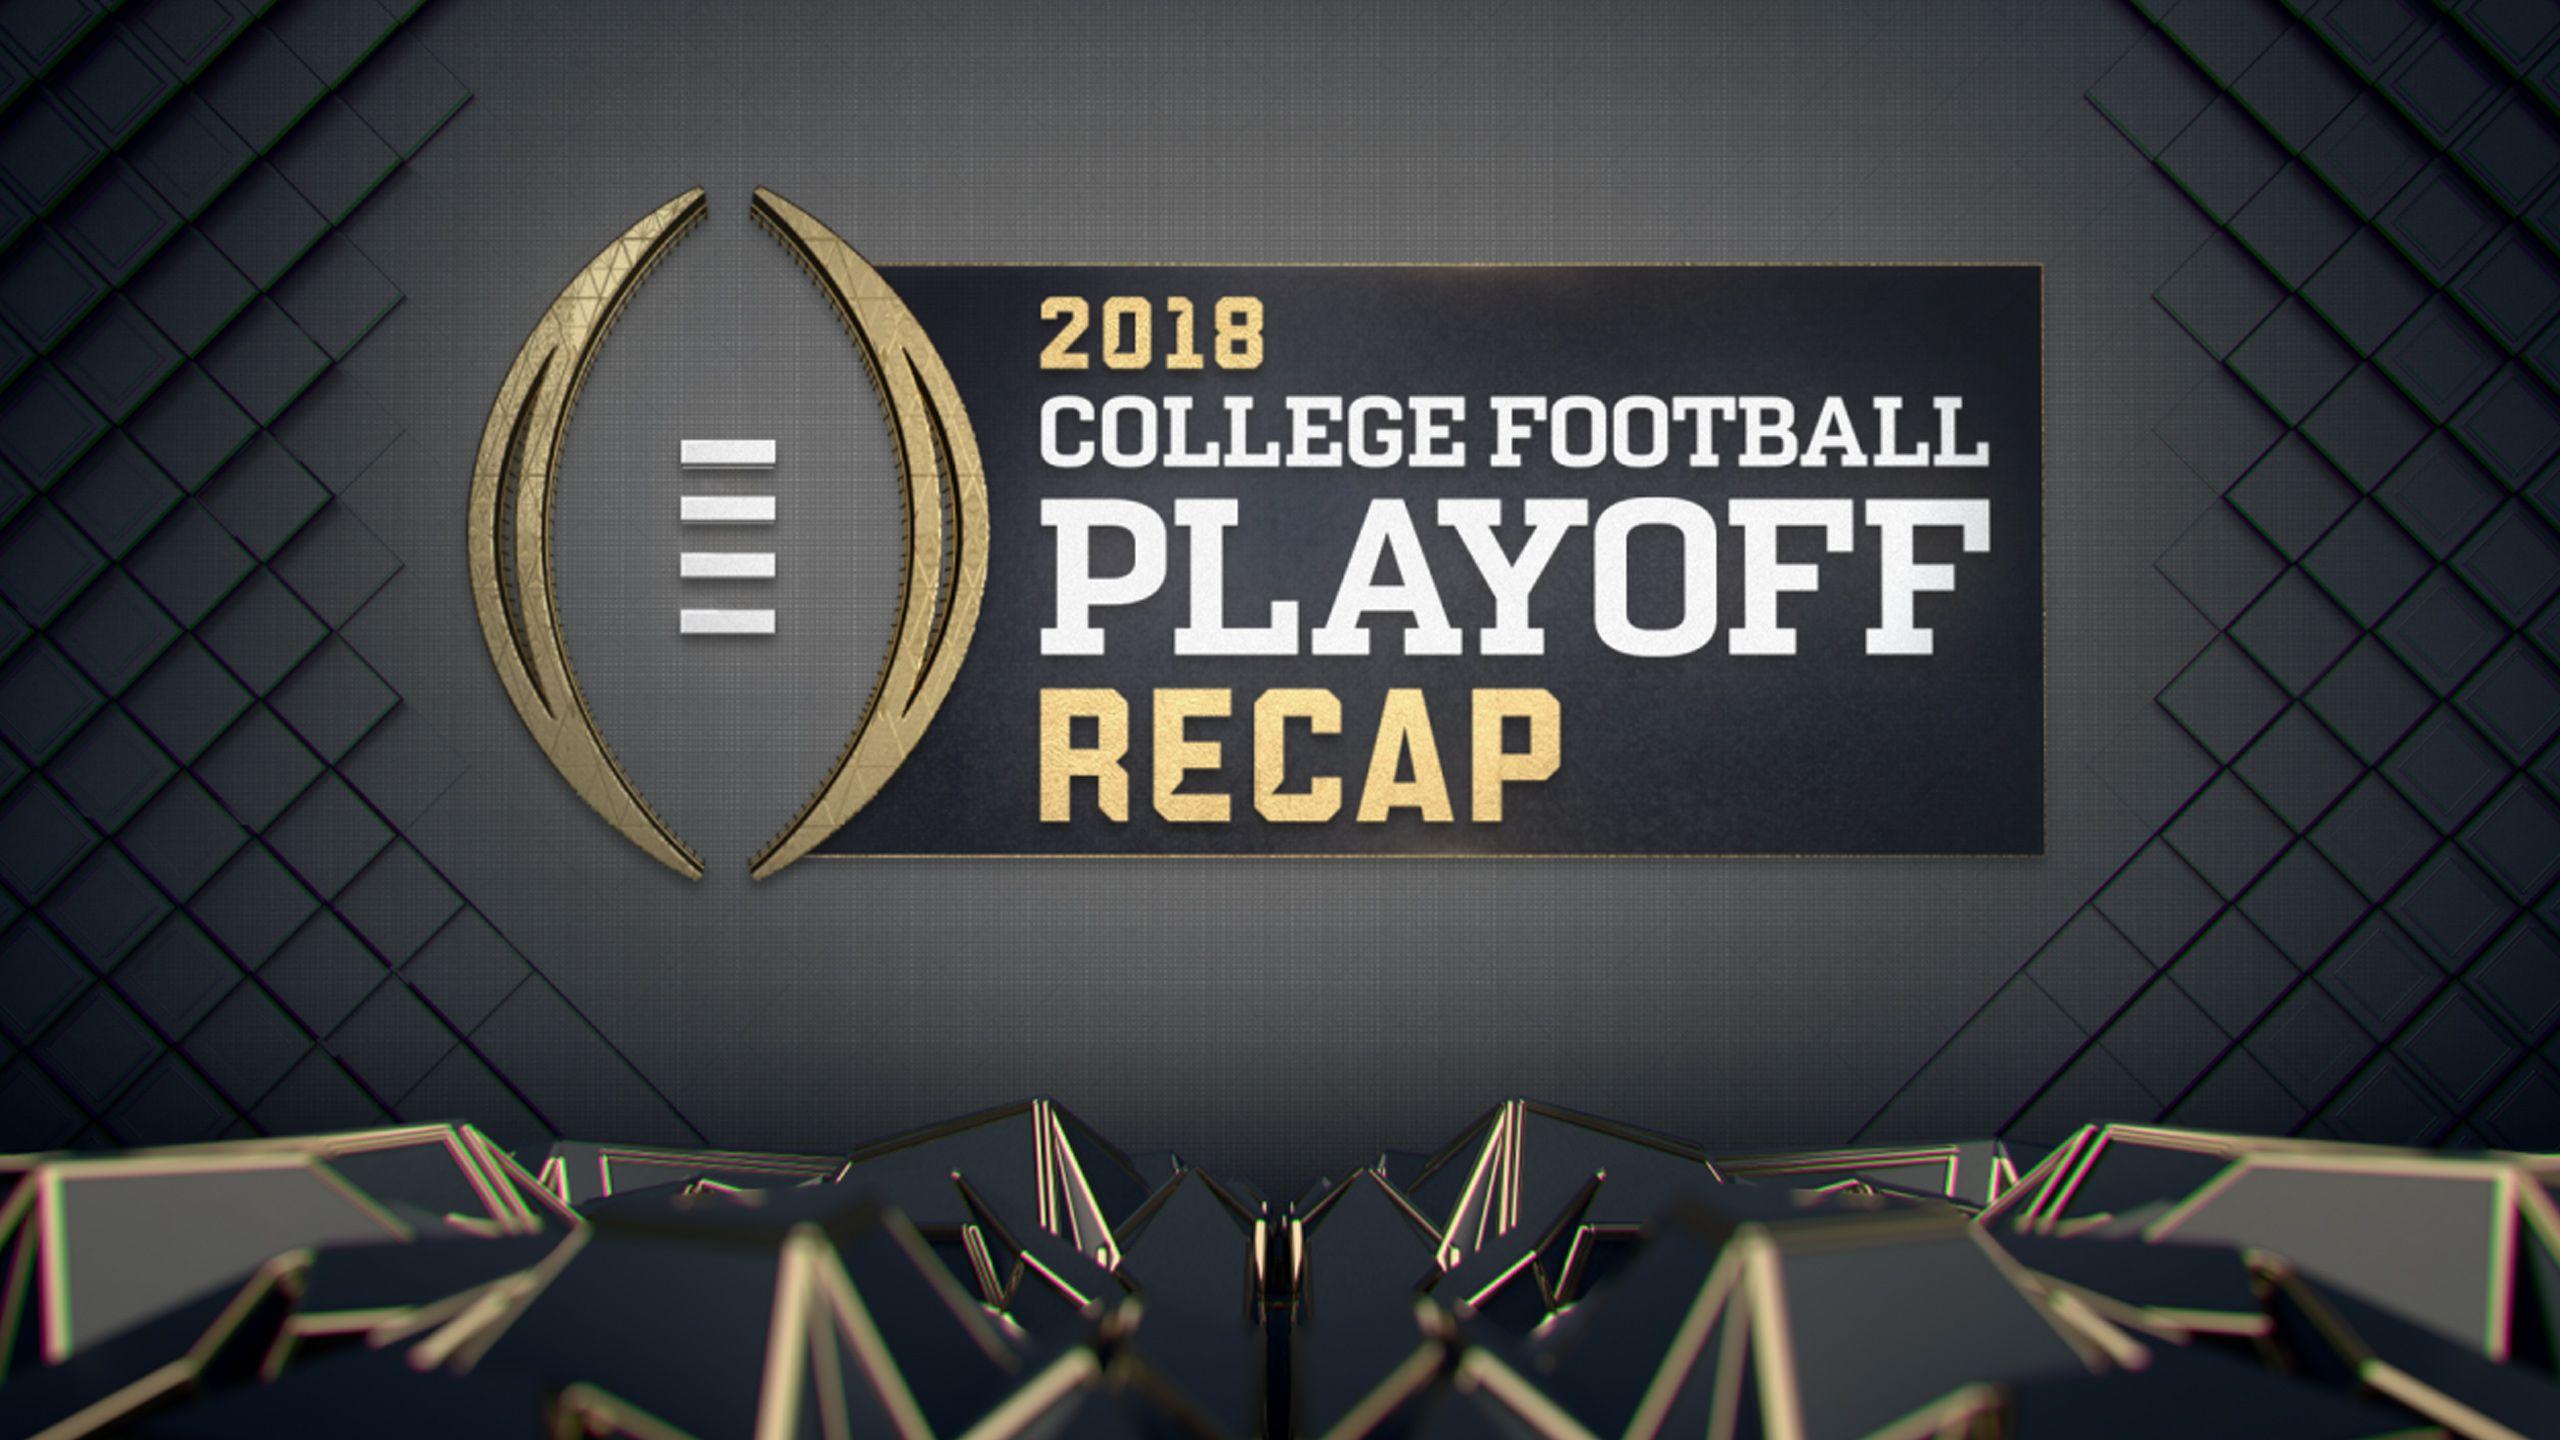 2018 College Football Playoff Recap Show